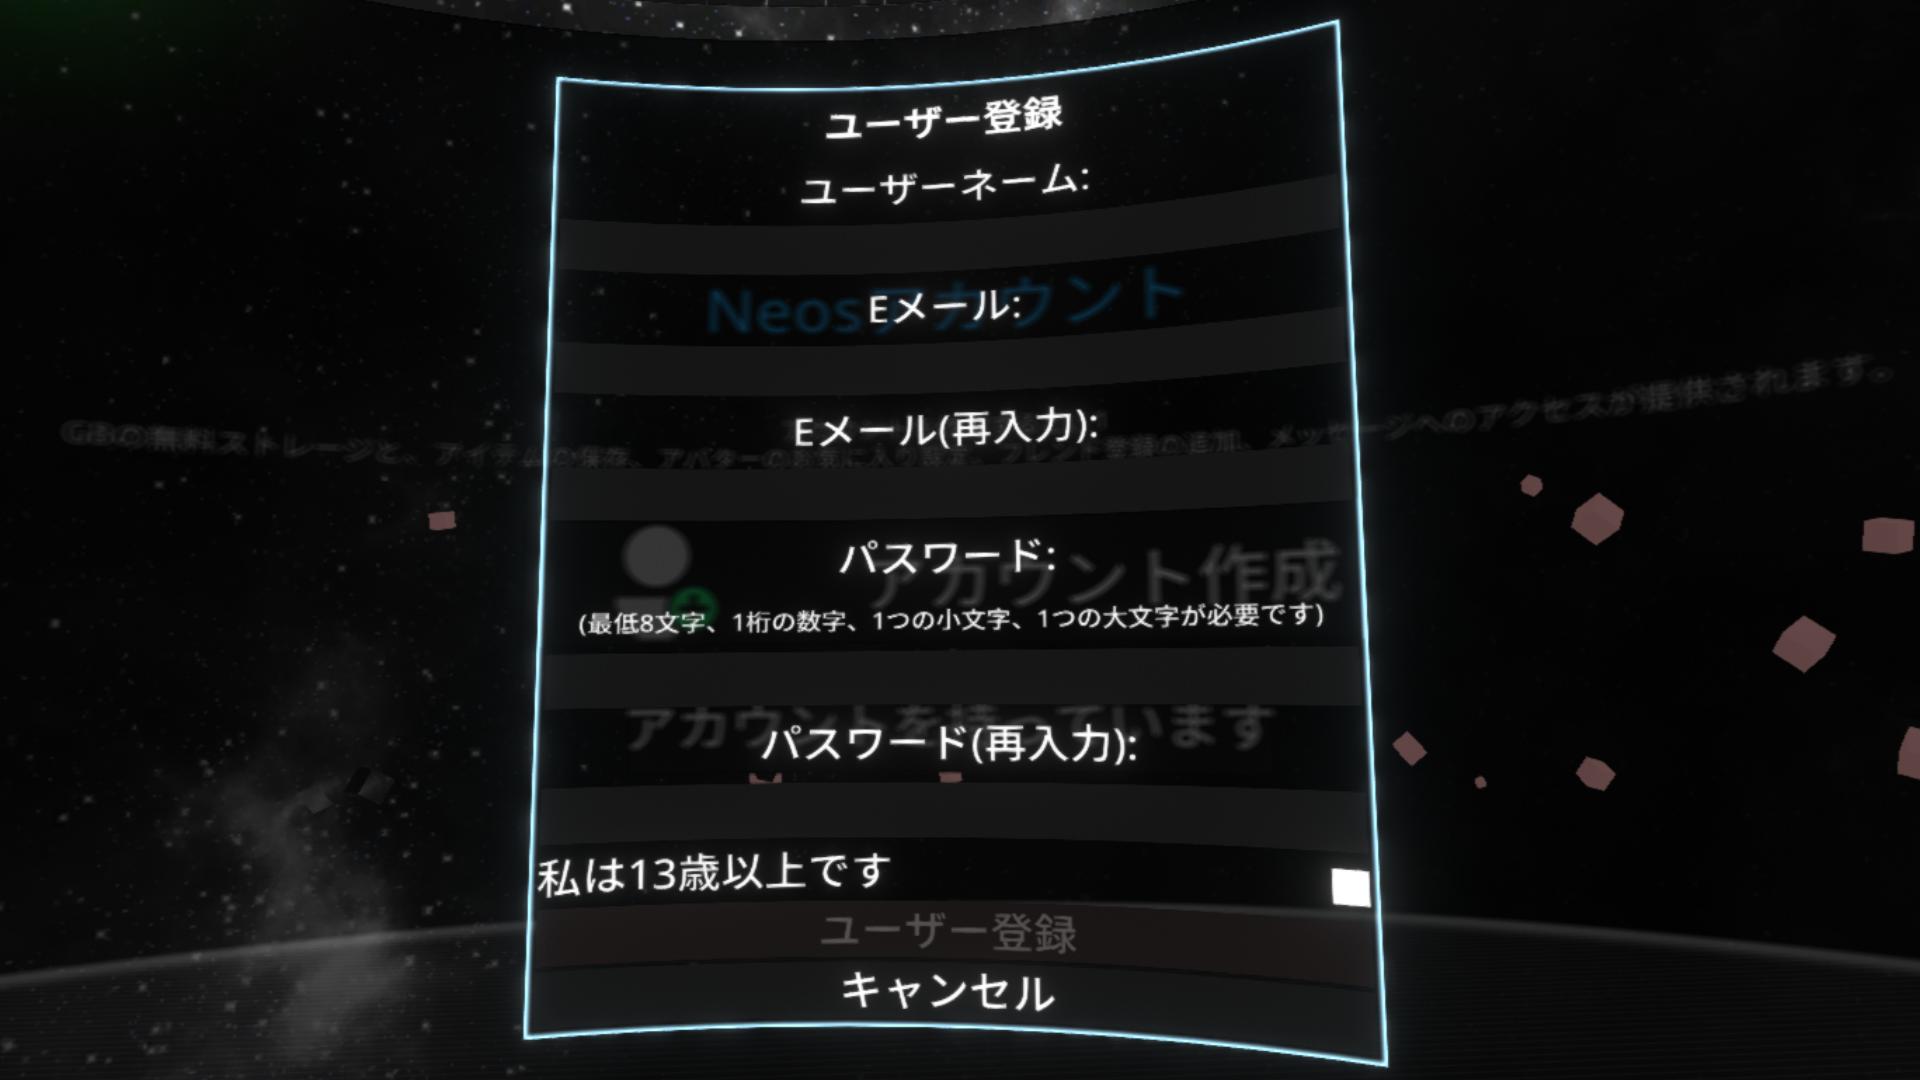 VR SNS【Neos VR】の始め方!まずはアカウントを作成